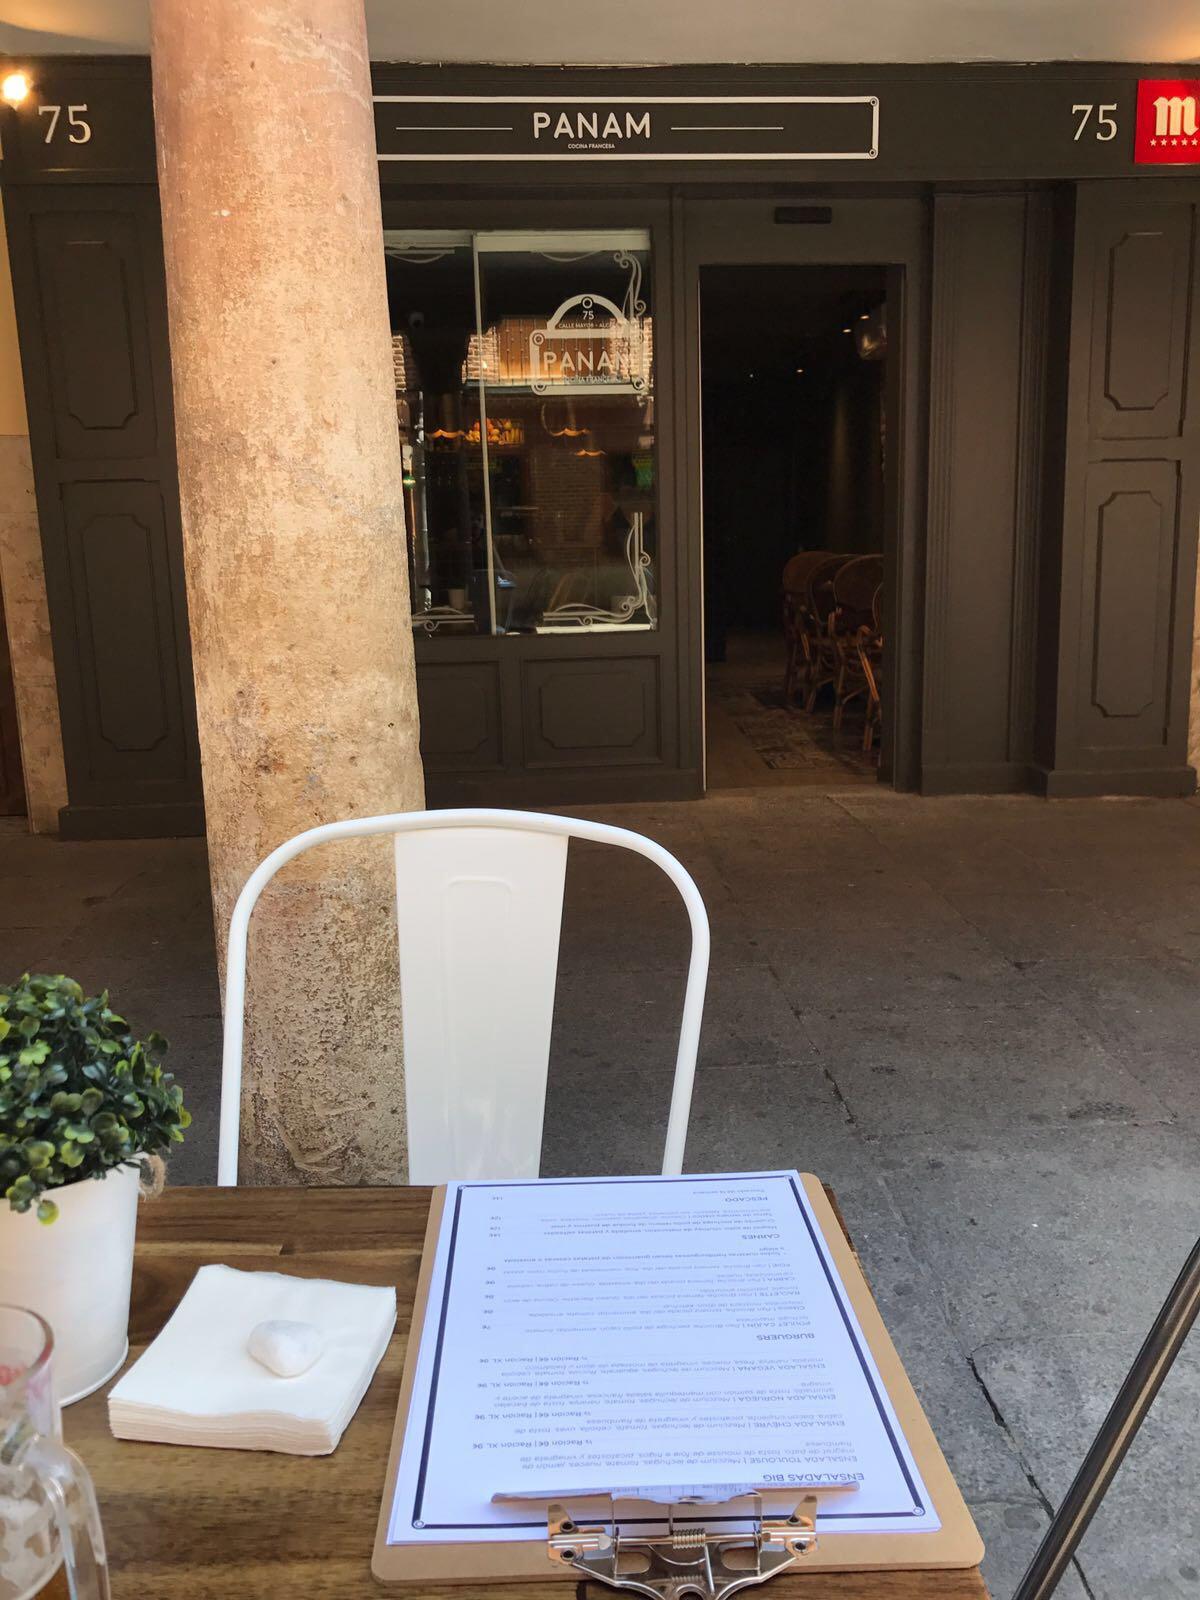 restaurante francés PANAM de Alcalá de Henares